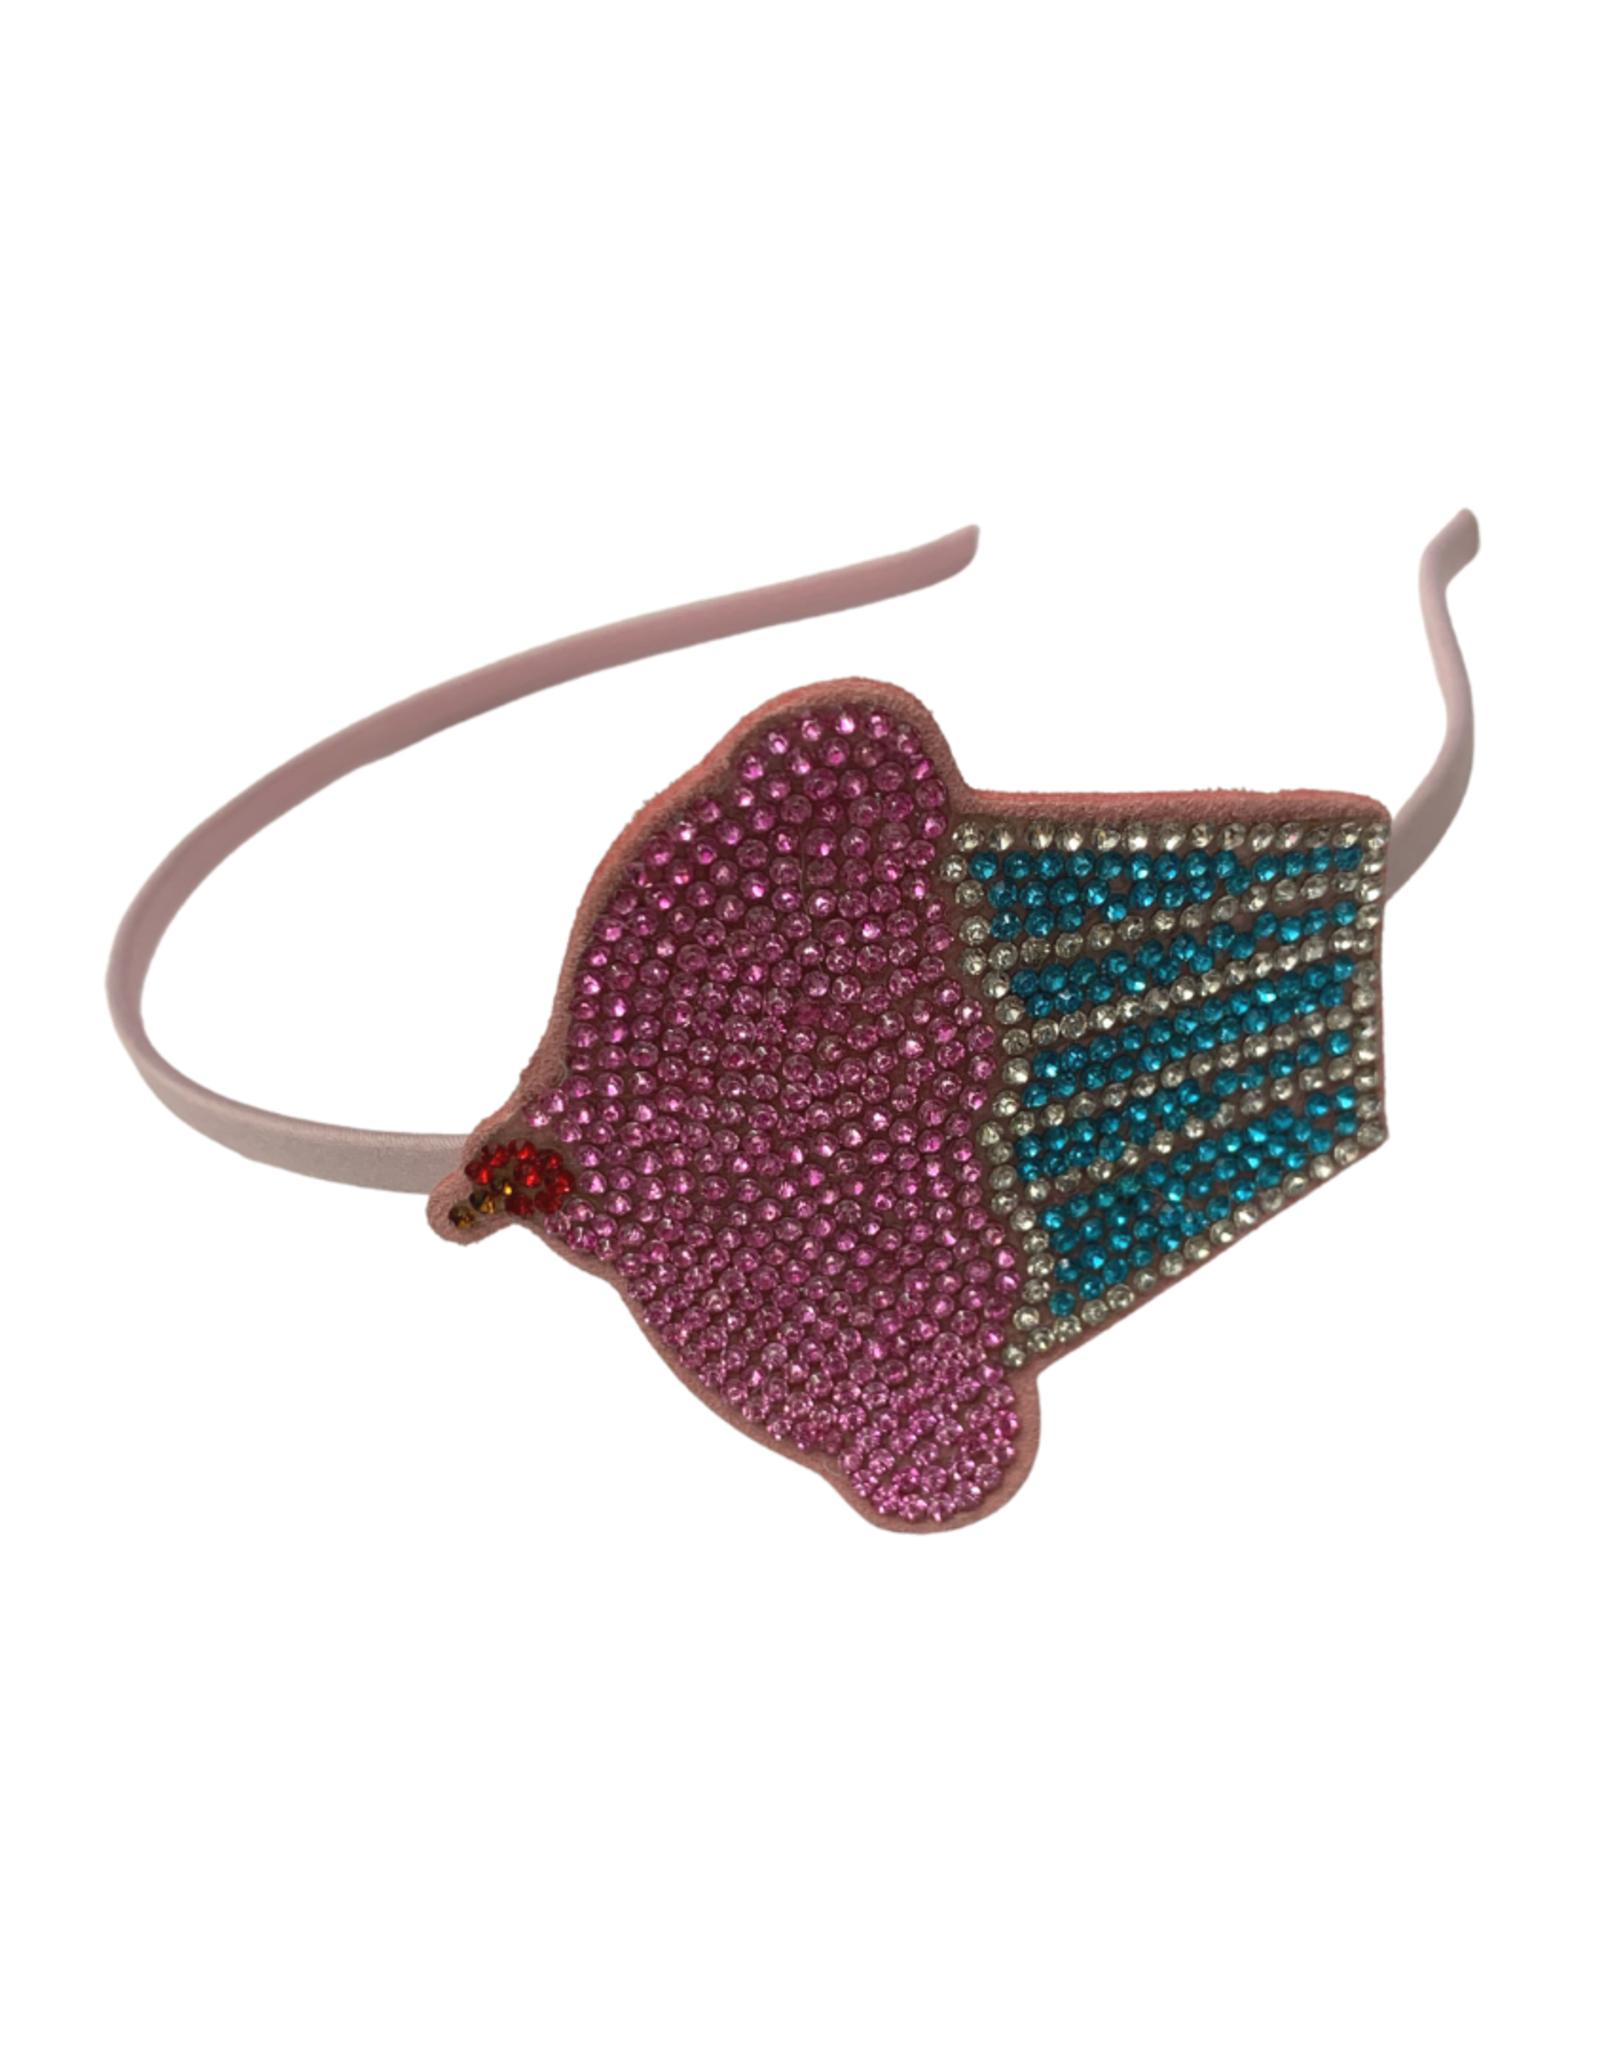 Bows Arts Rhinestone Motif Headband - Cupcake